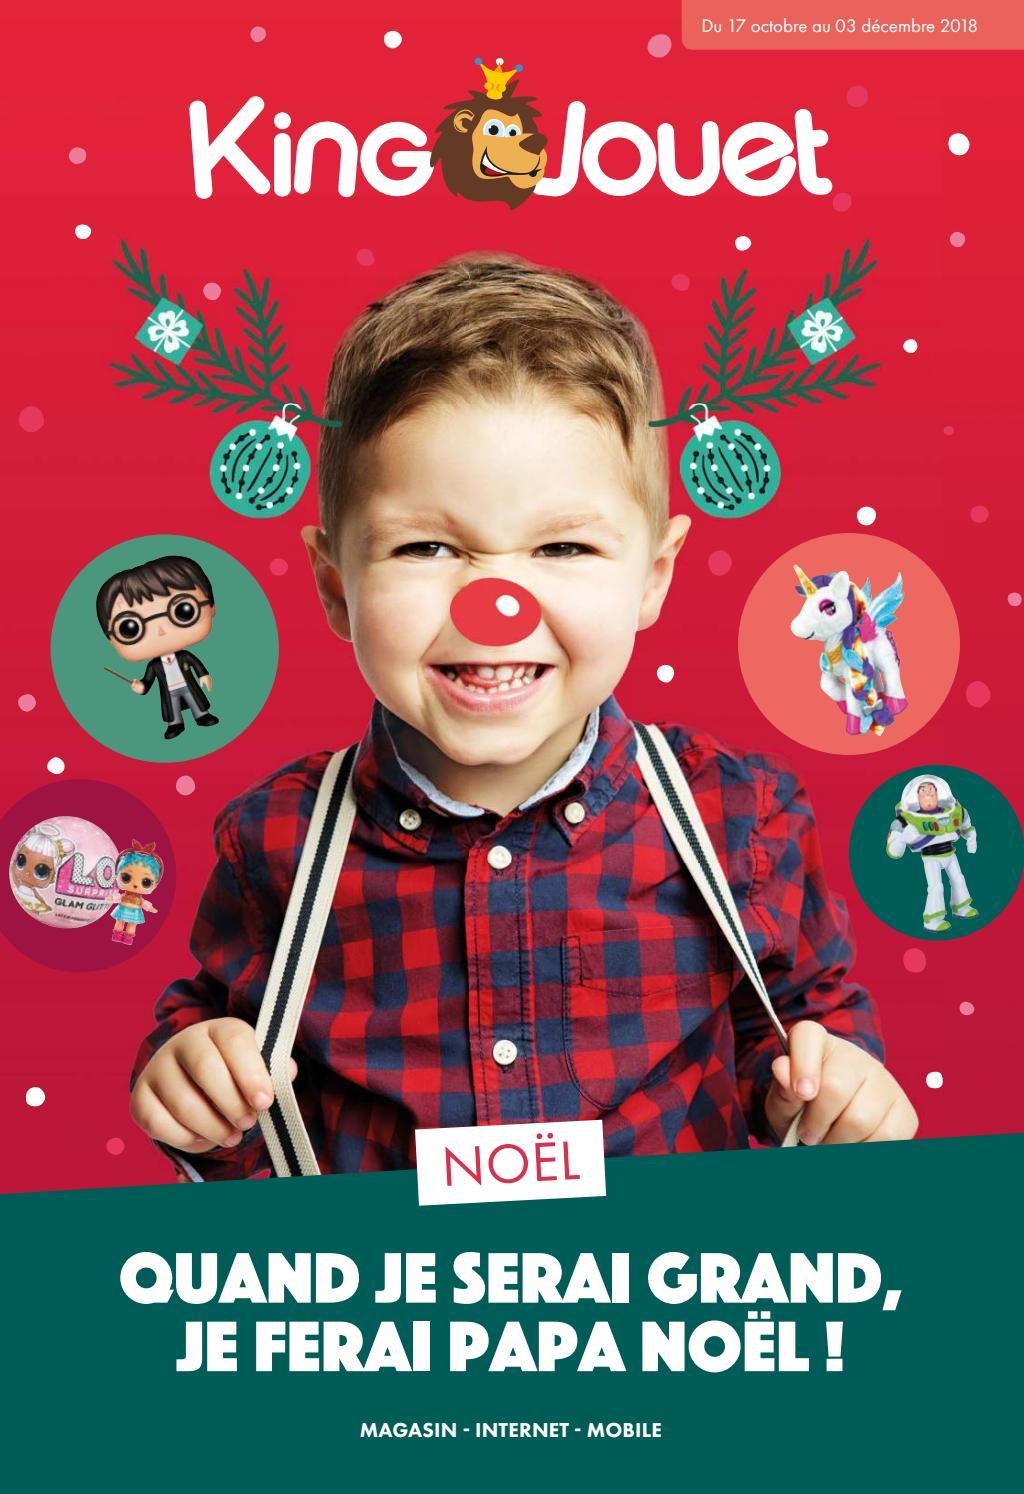 Catalogue Jouets King Jouet Noel 2018 By Bonsplans Issuu